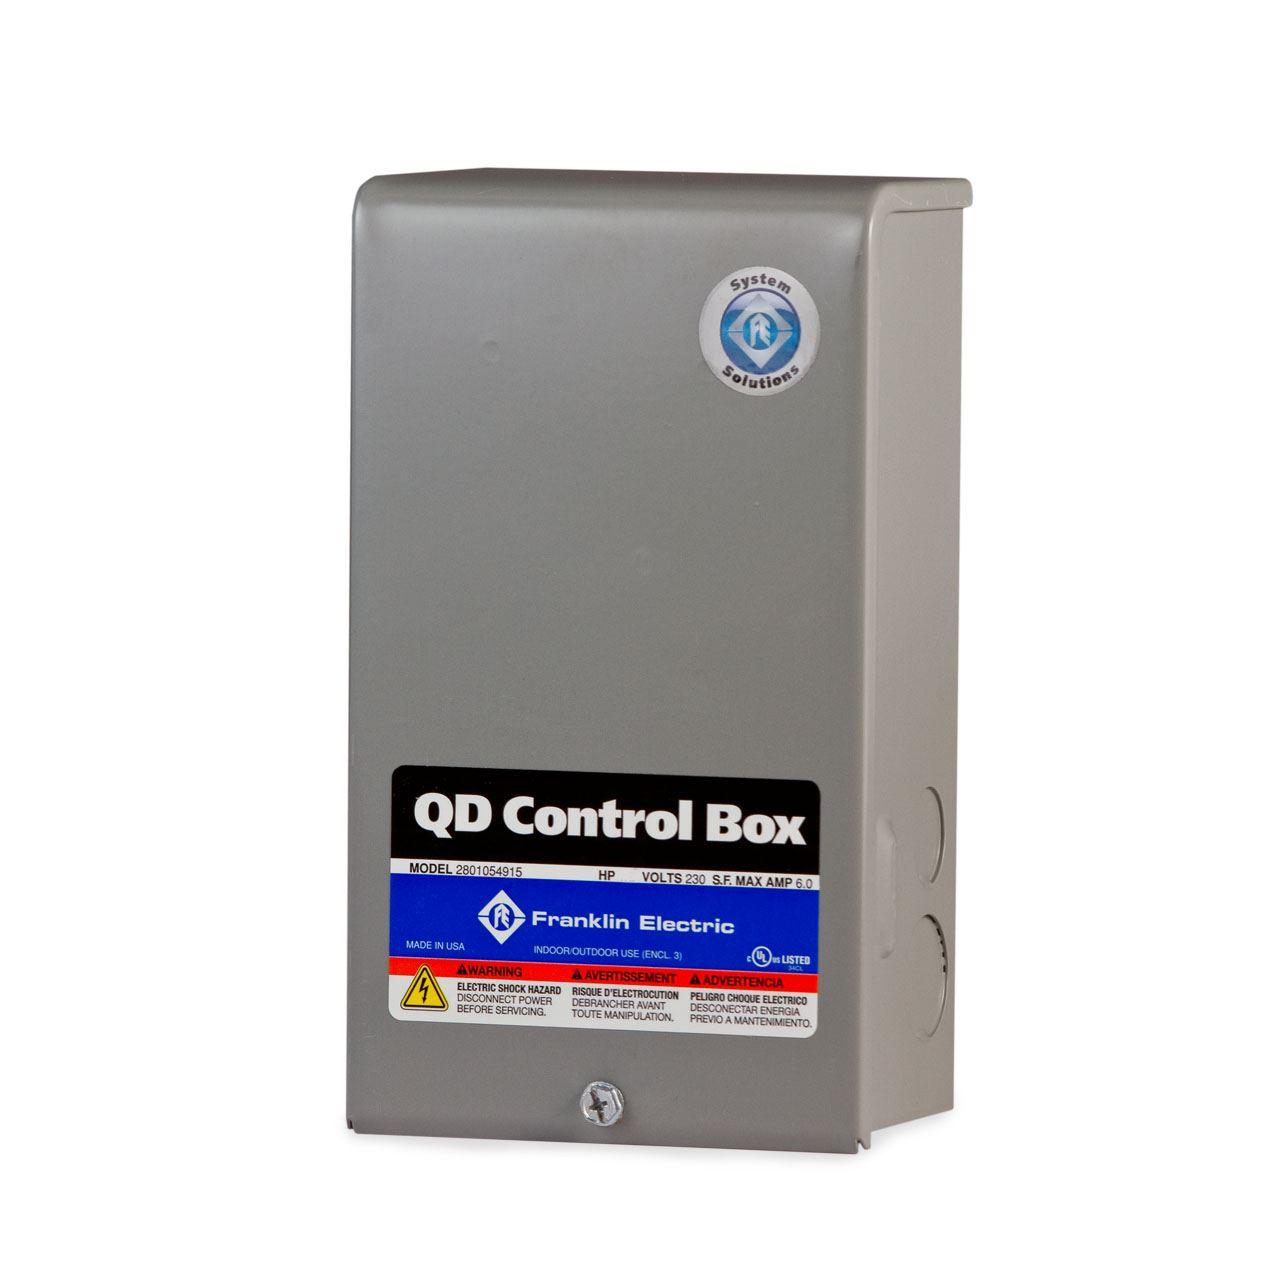 1//2 HP 230V Franklin QD Control Box Submersible Water Pump # 2801054915